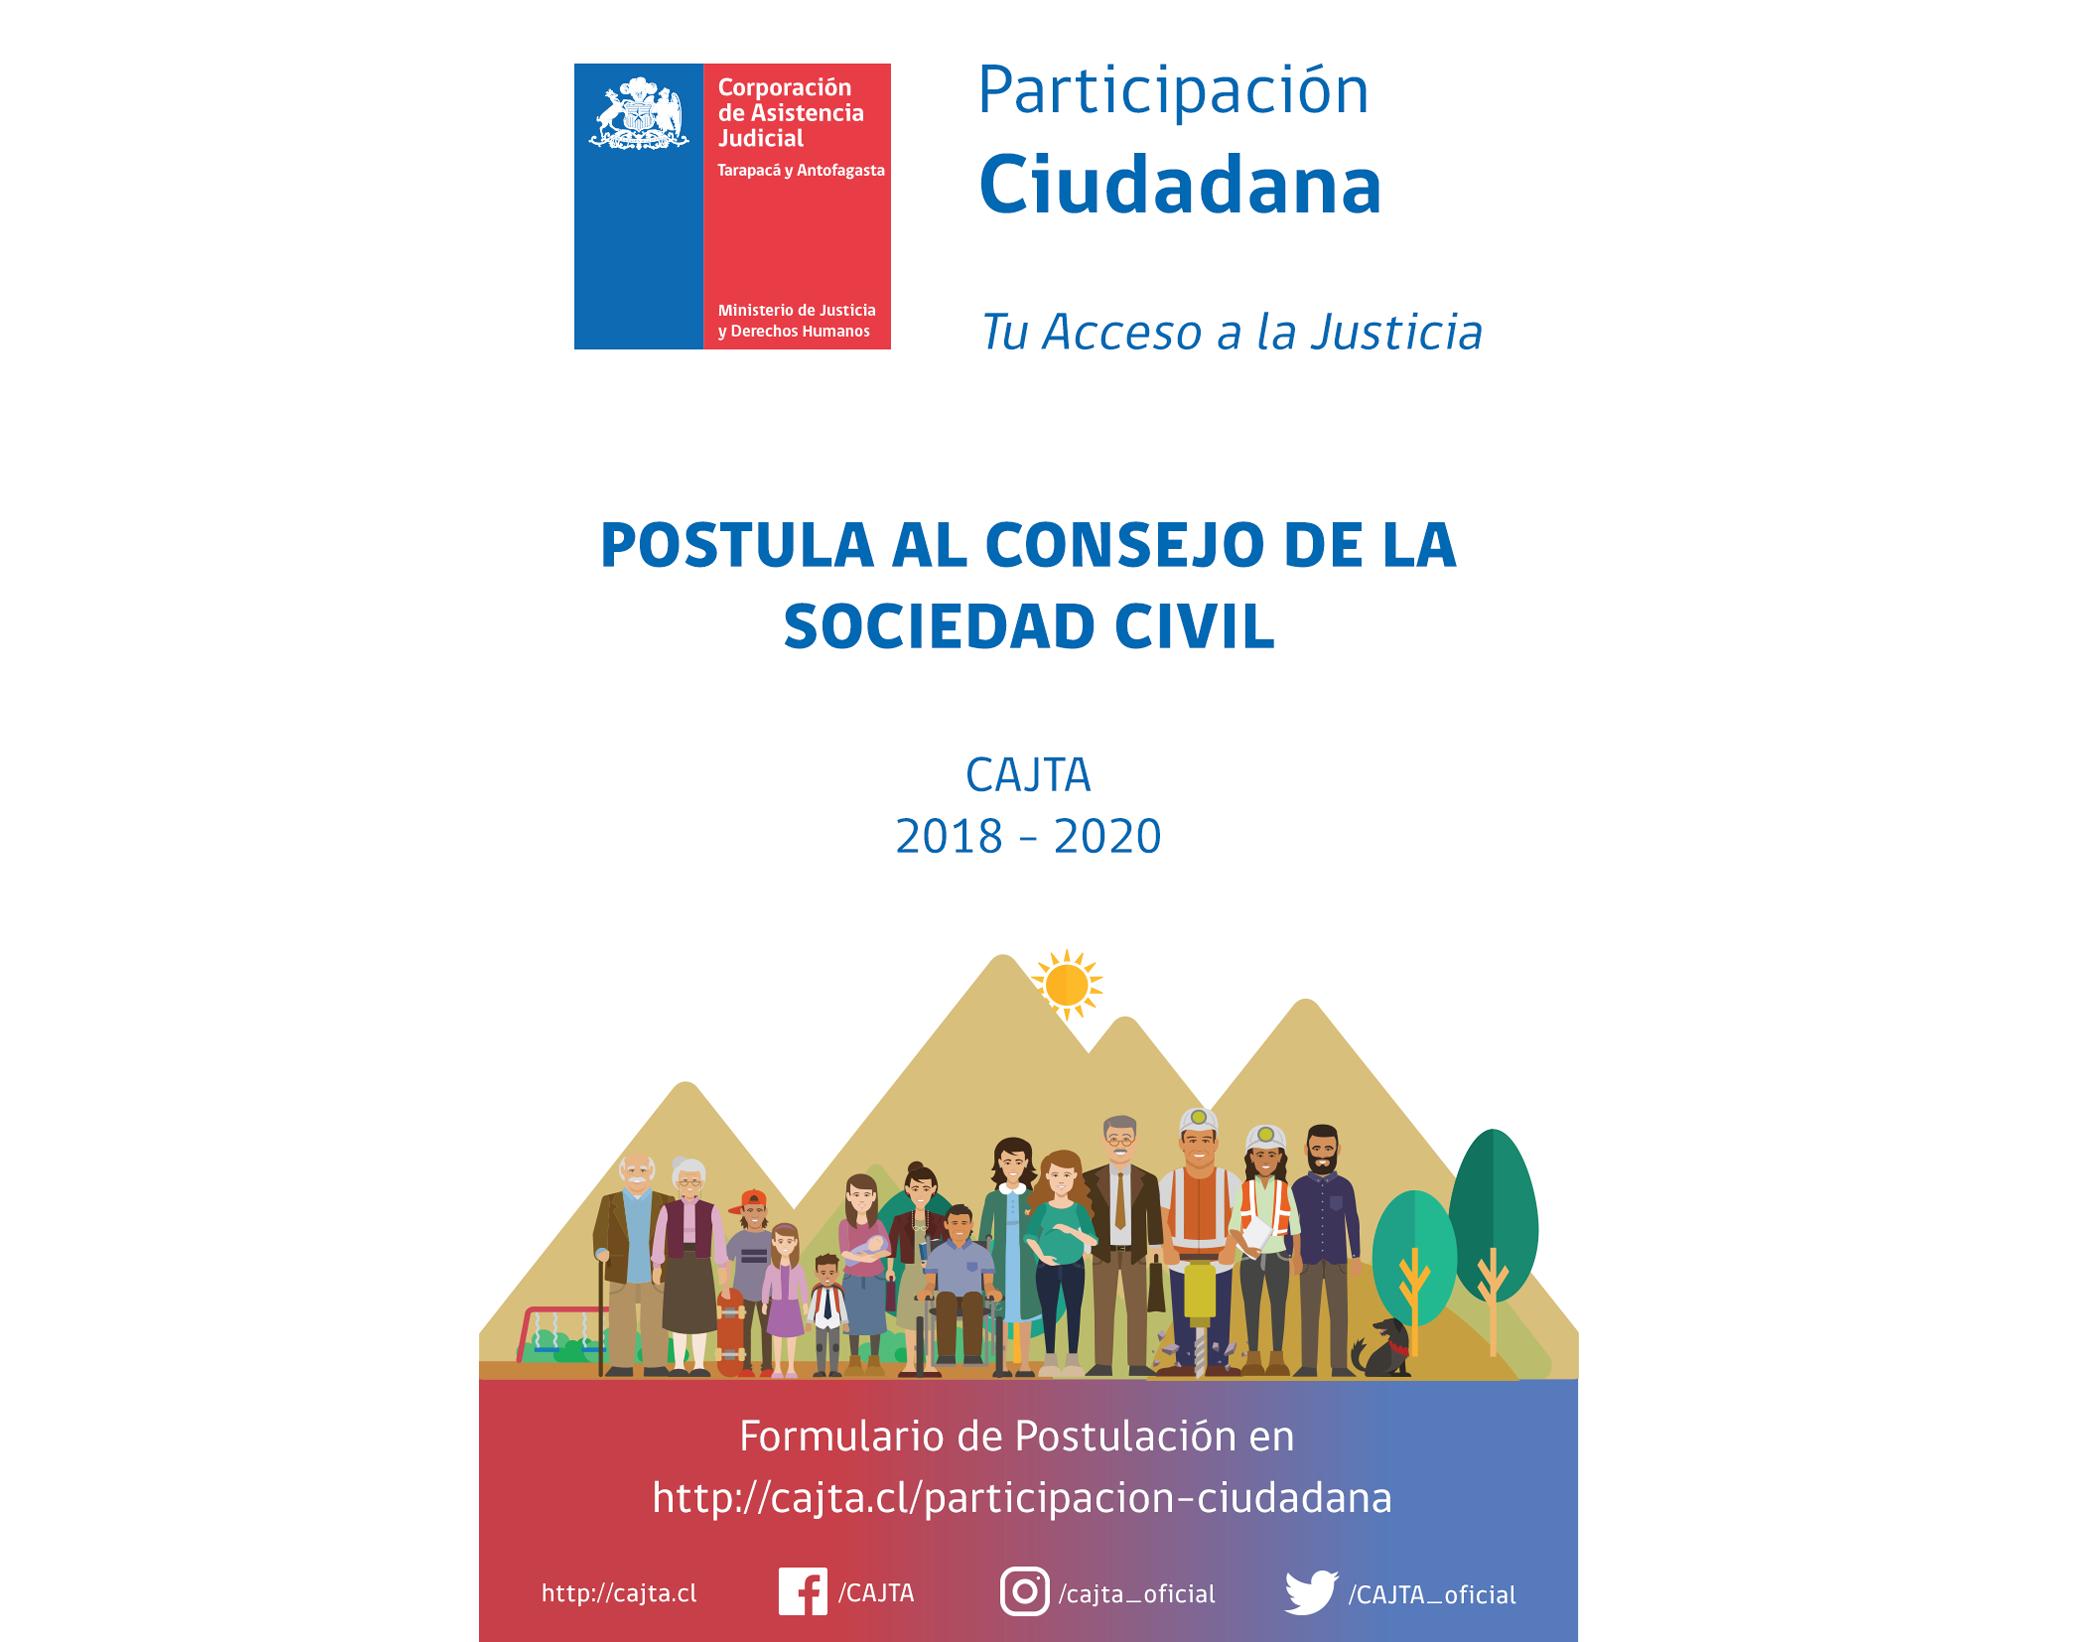 Postula al Consejo de la Sociedad Civil CAJTA 2018 - 2020